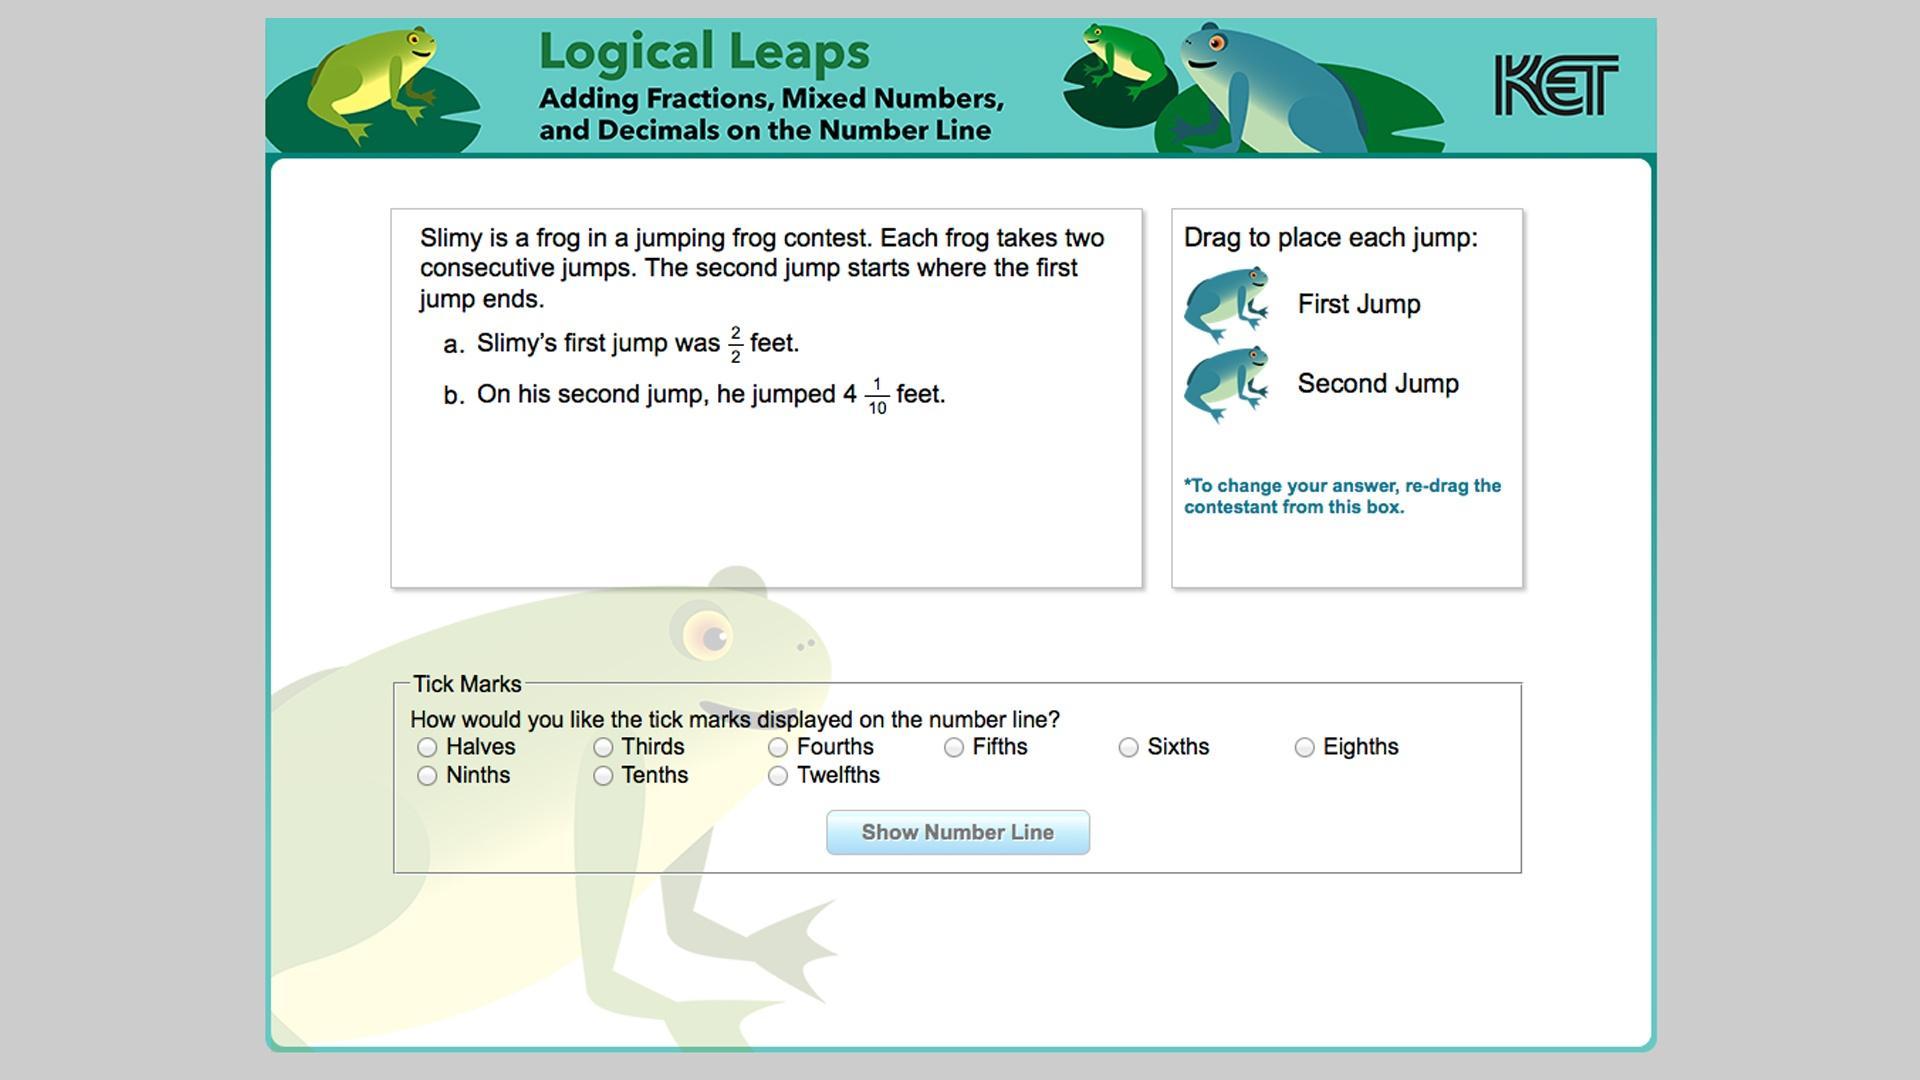 Logical Leaps